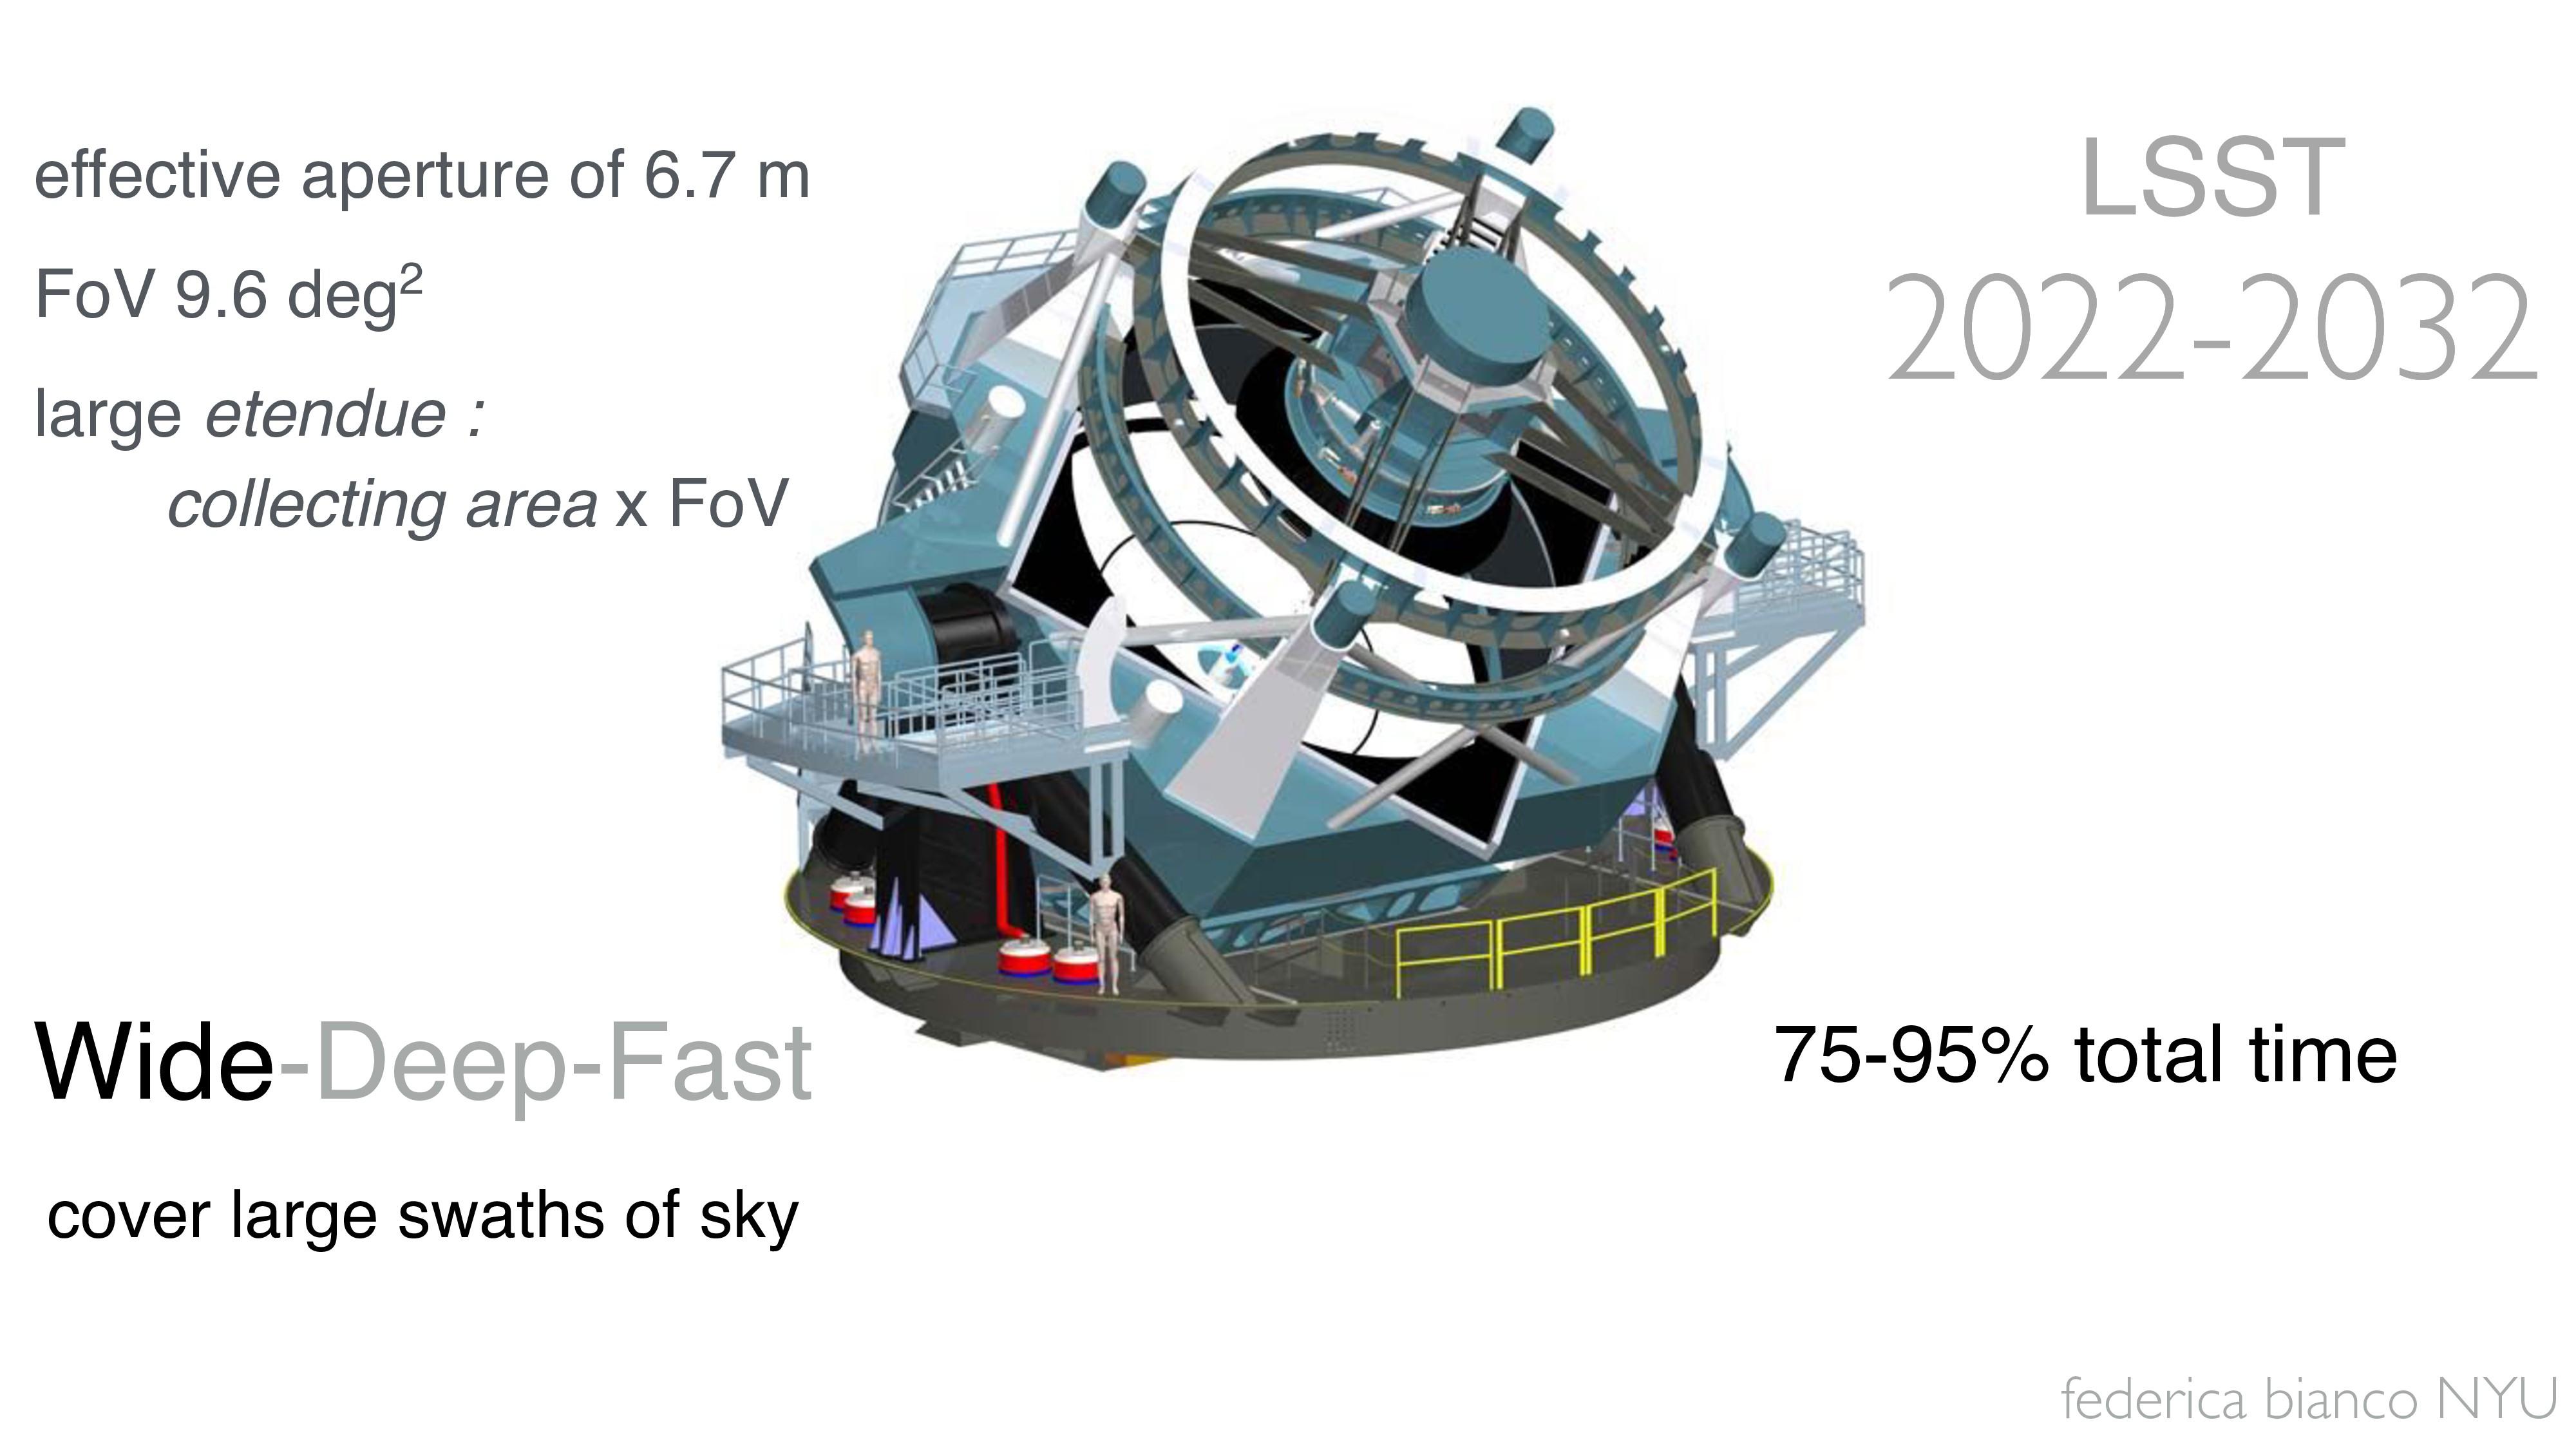 federica bianco NYU LSST 2022-2032 Wide-Deep-Fa...